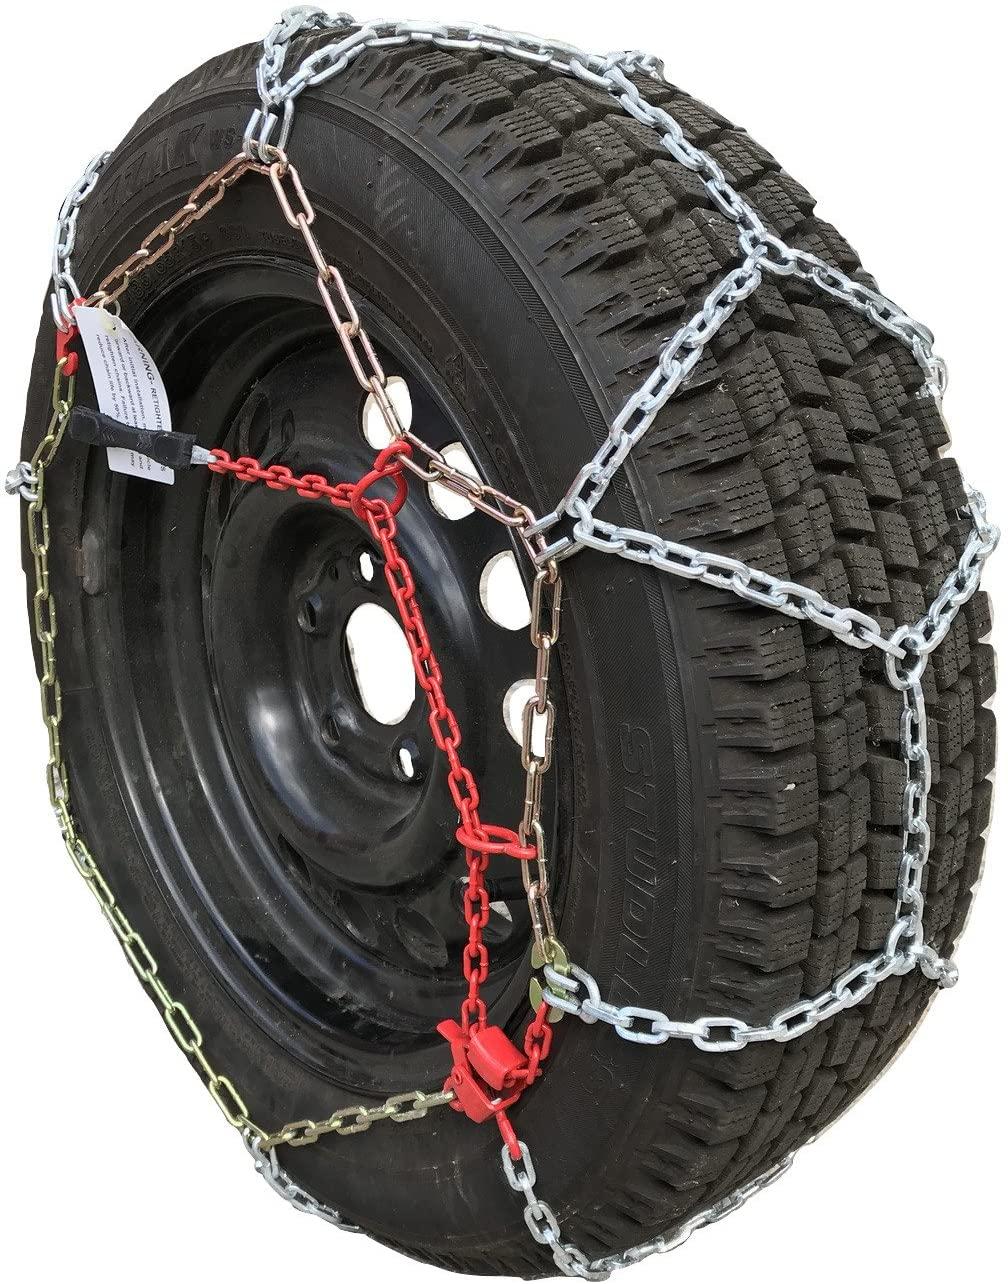 TireChain.com 235/65R17, 235/65 17 ONORM Diamond Tire Chains Set of 2